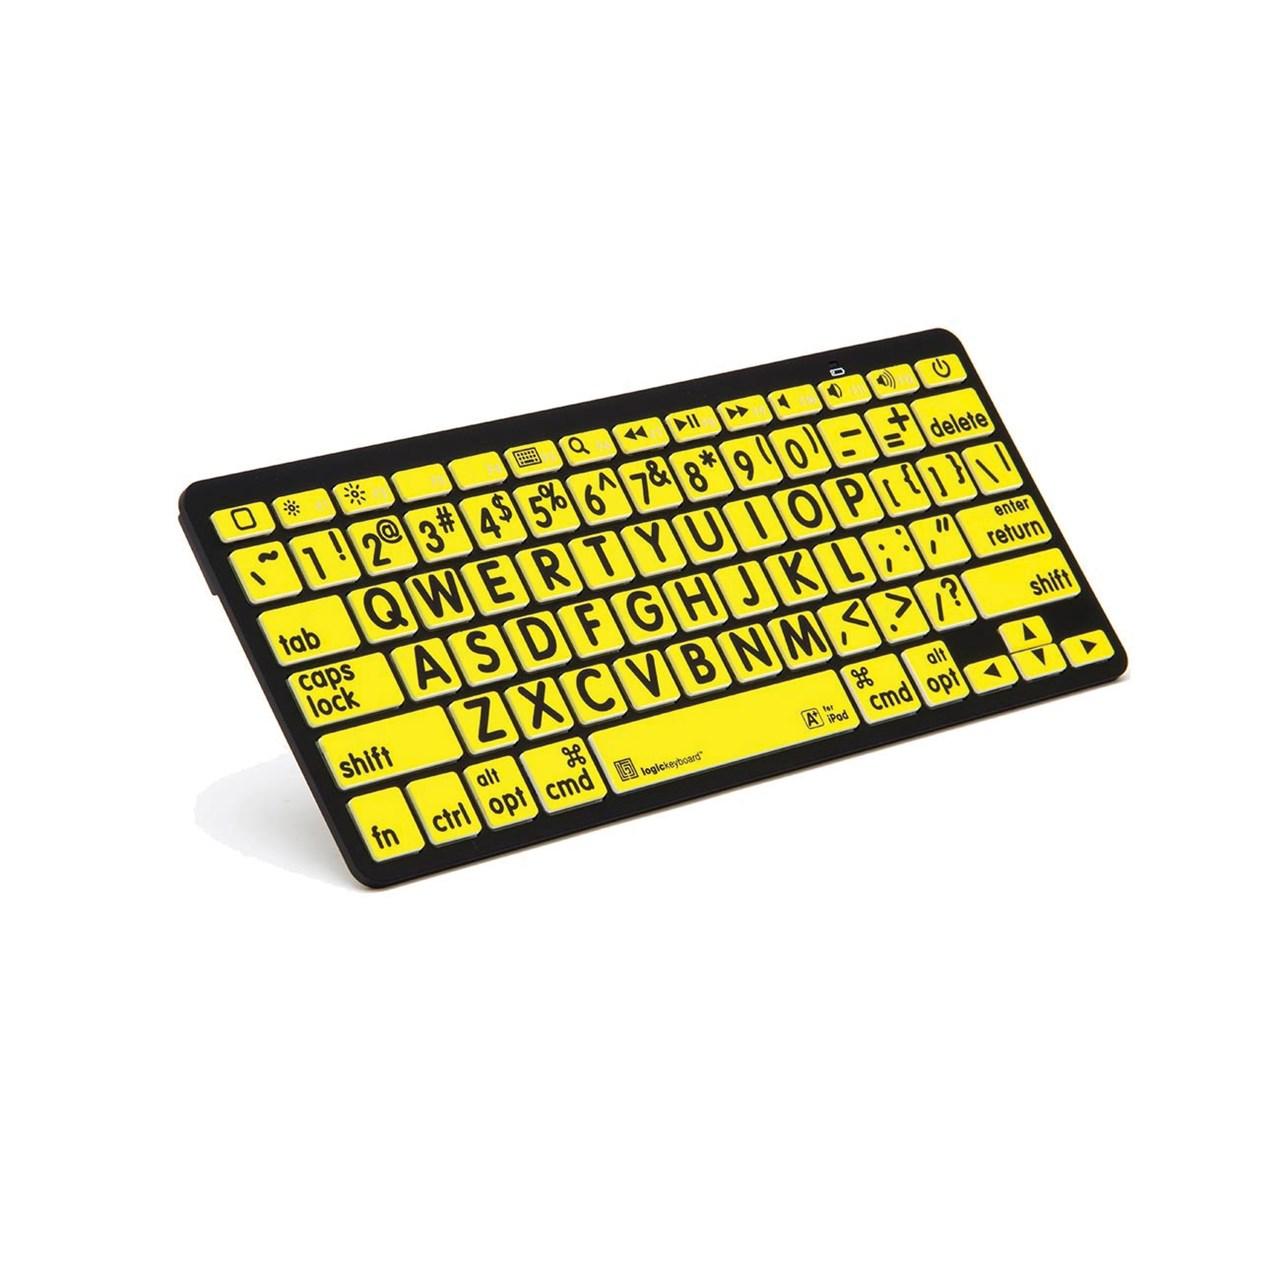 Large Print Black on Yellow Apple BlueTooth Keyboard